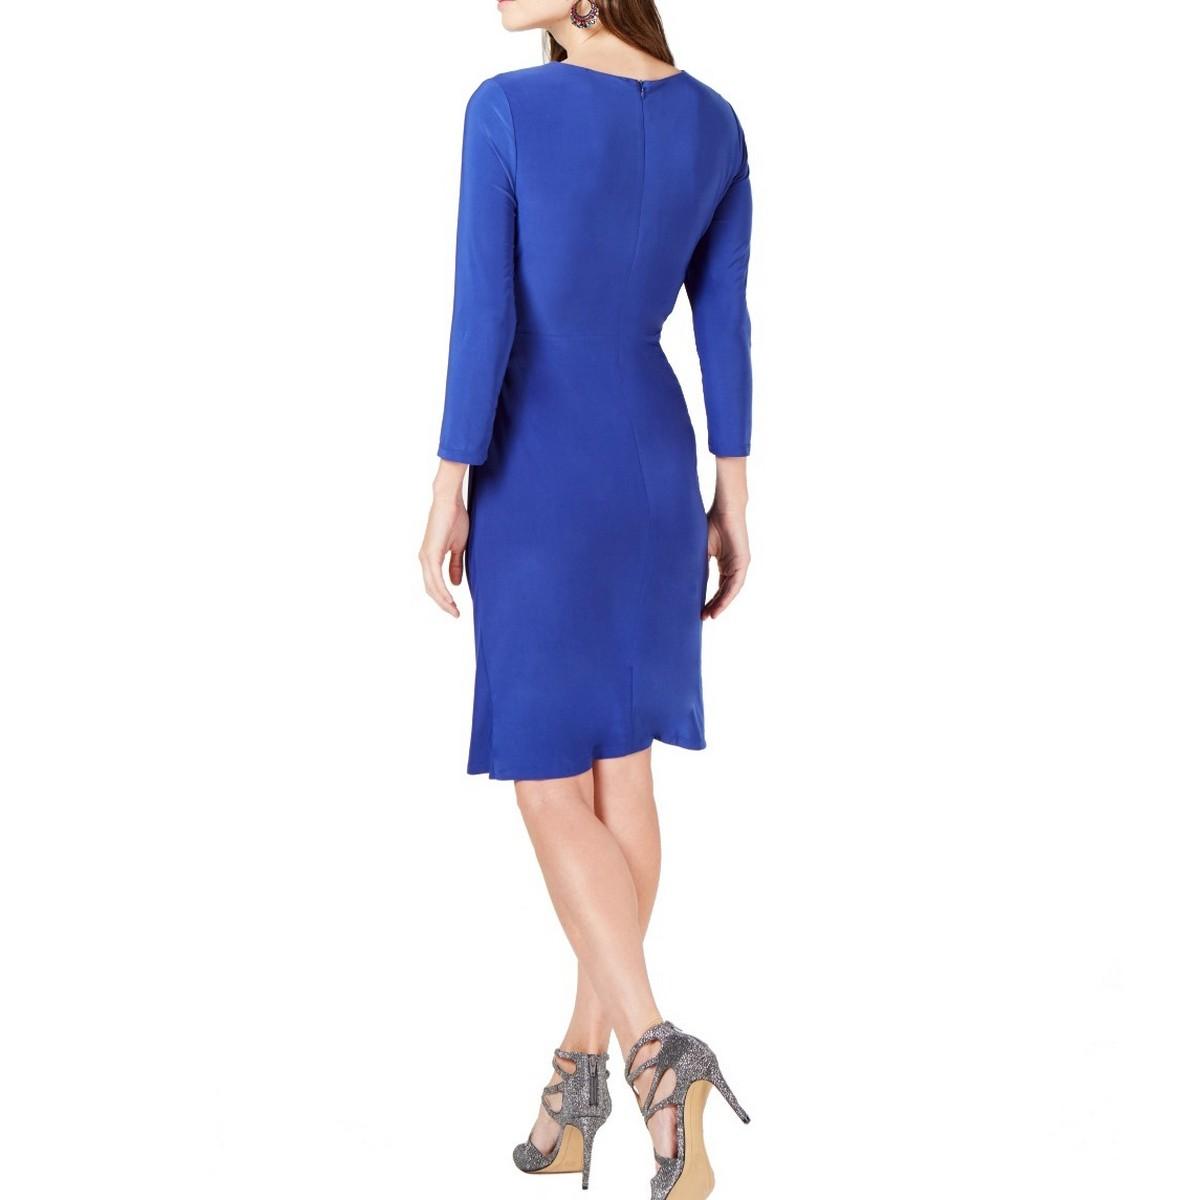 INC-NEW-Women-039-s-Solid-Ruched-3-4-sleeve-V-Neck-Sheath-Dress-TEDO thumbnail 6